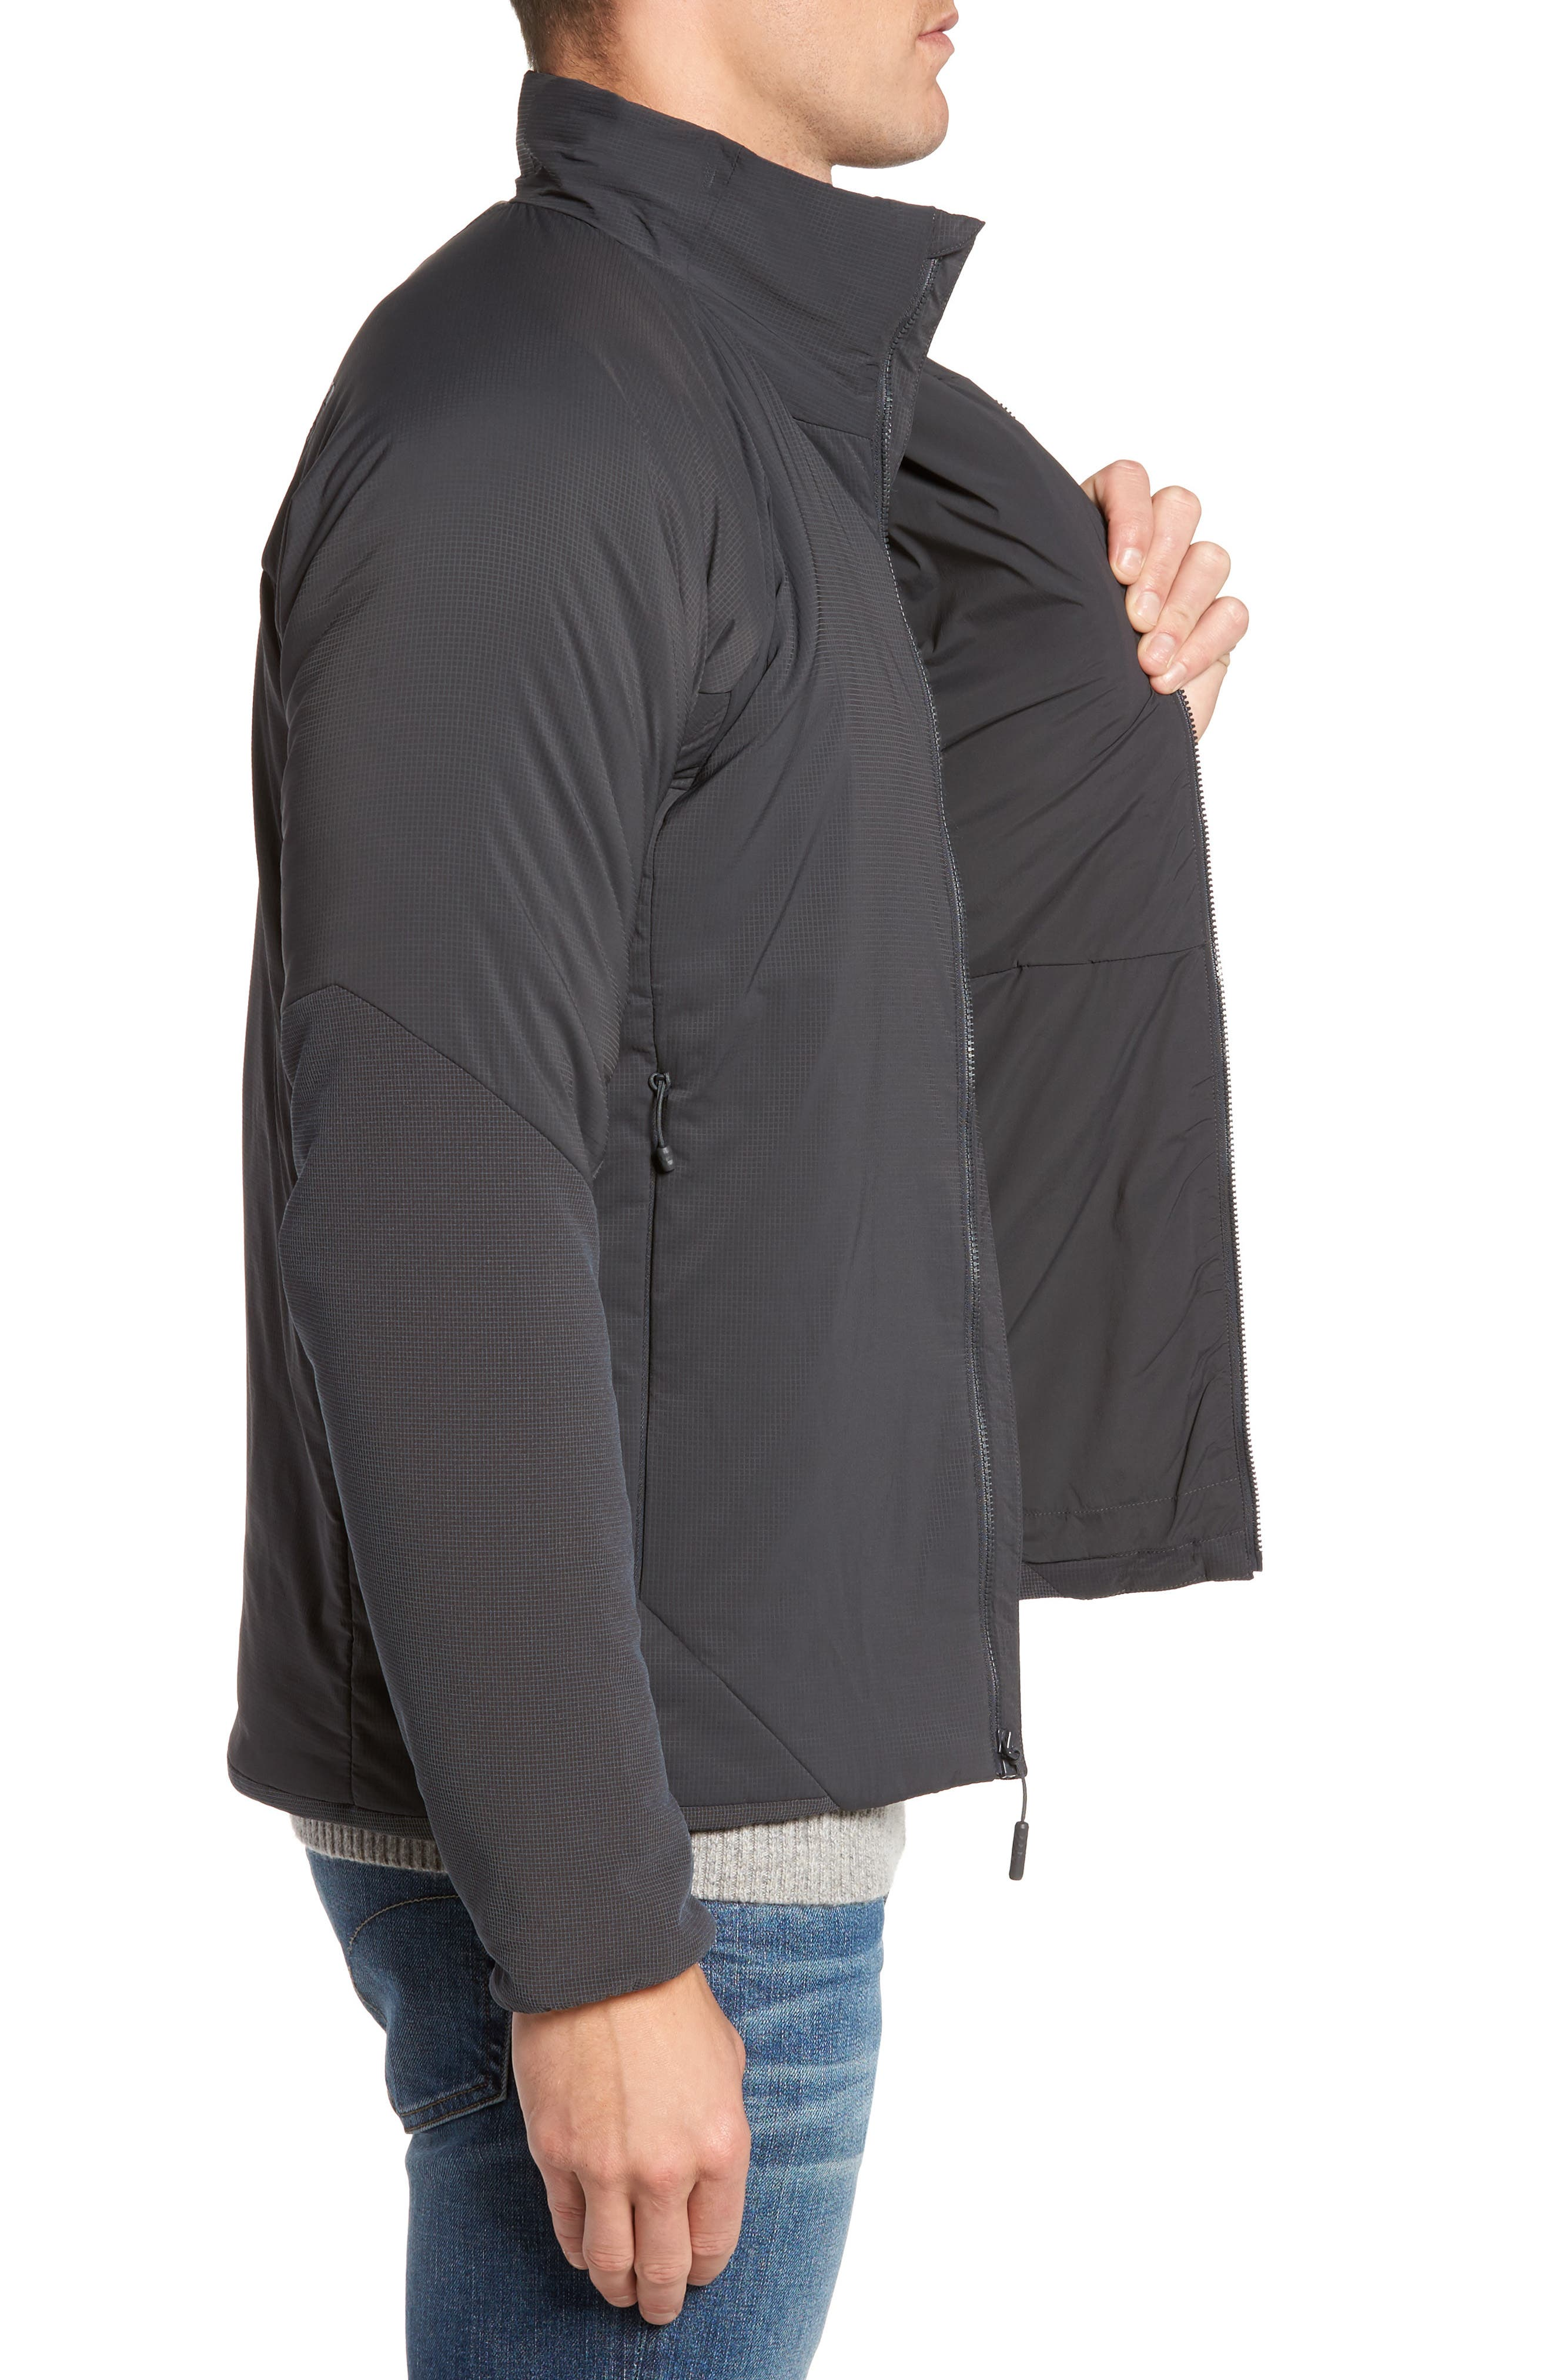 Ventrix Water Resistant Ripstop Jacket,                             Alternate thumbnail 3, color,                             Asphalt Grey / Acid Yellow